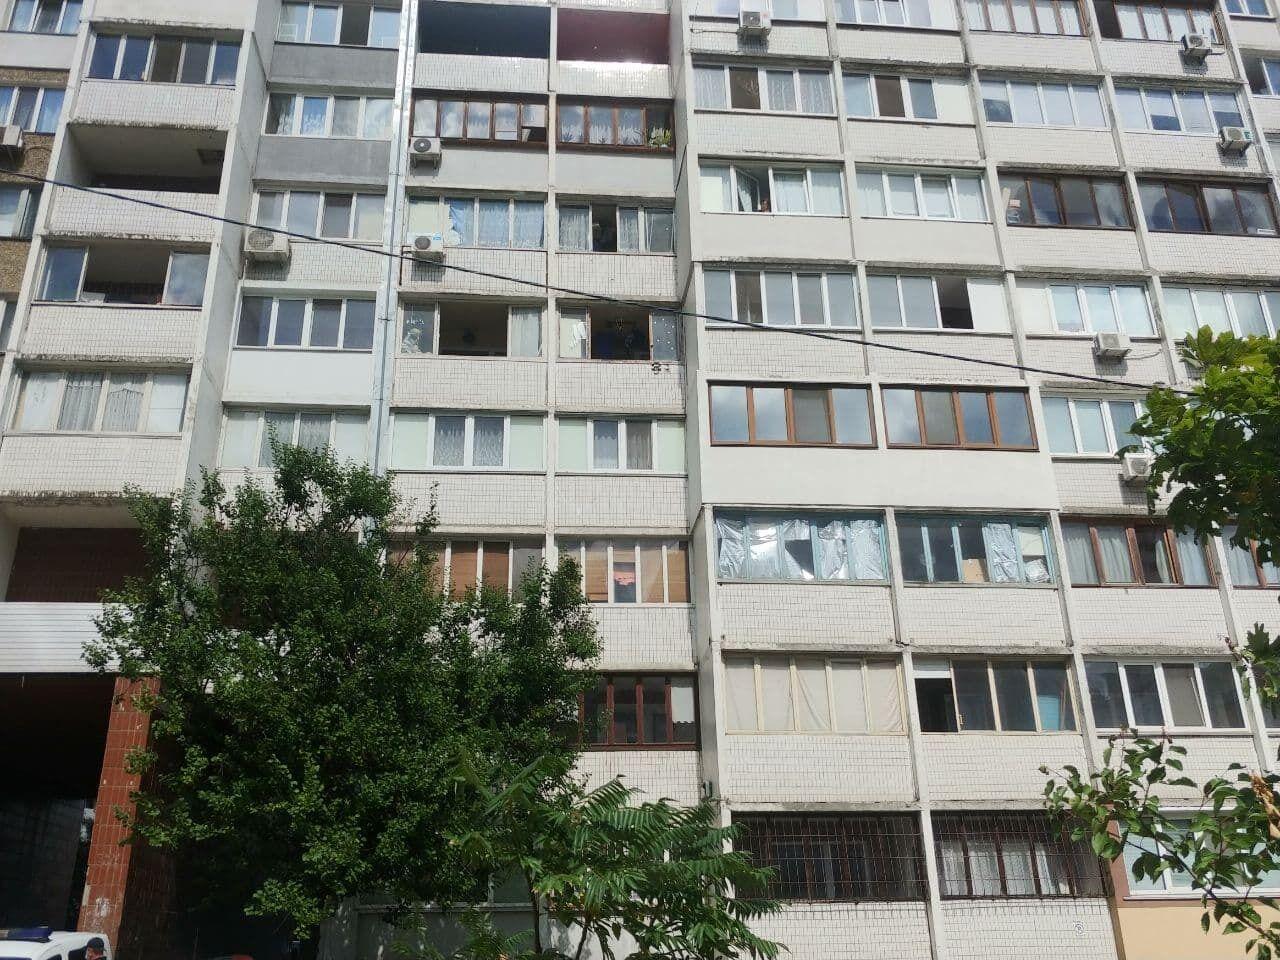 Инцидент произошел на улице Заболотного.